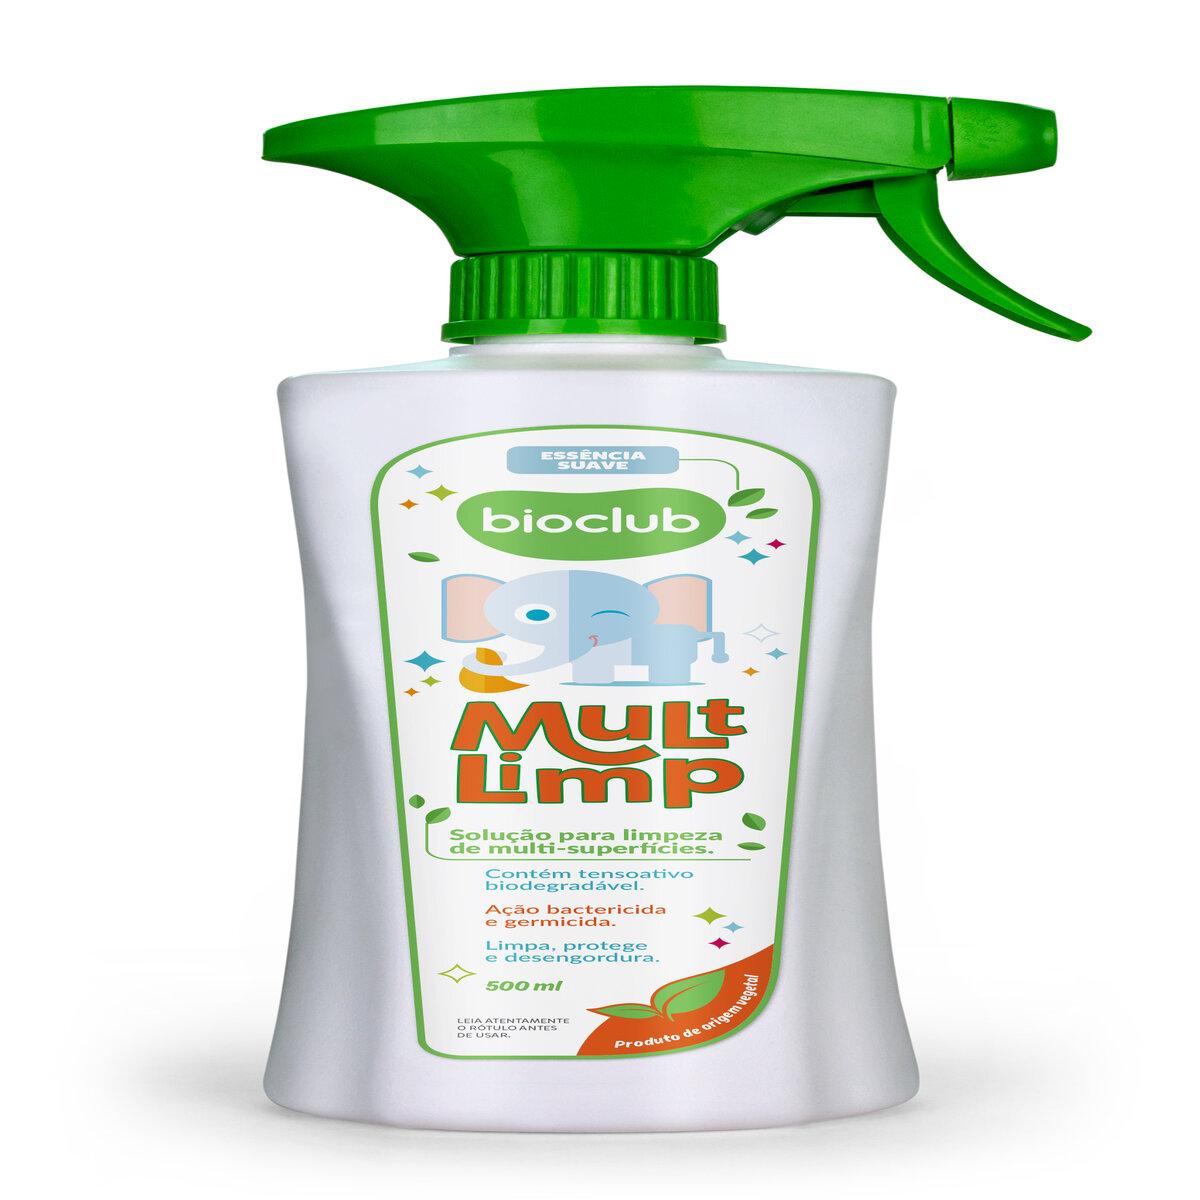 Spray Multi Limpeza de Superfícies 500 ml - BioClub